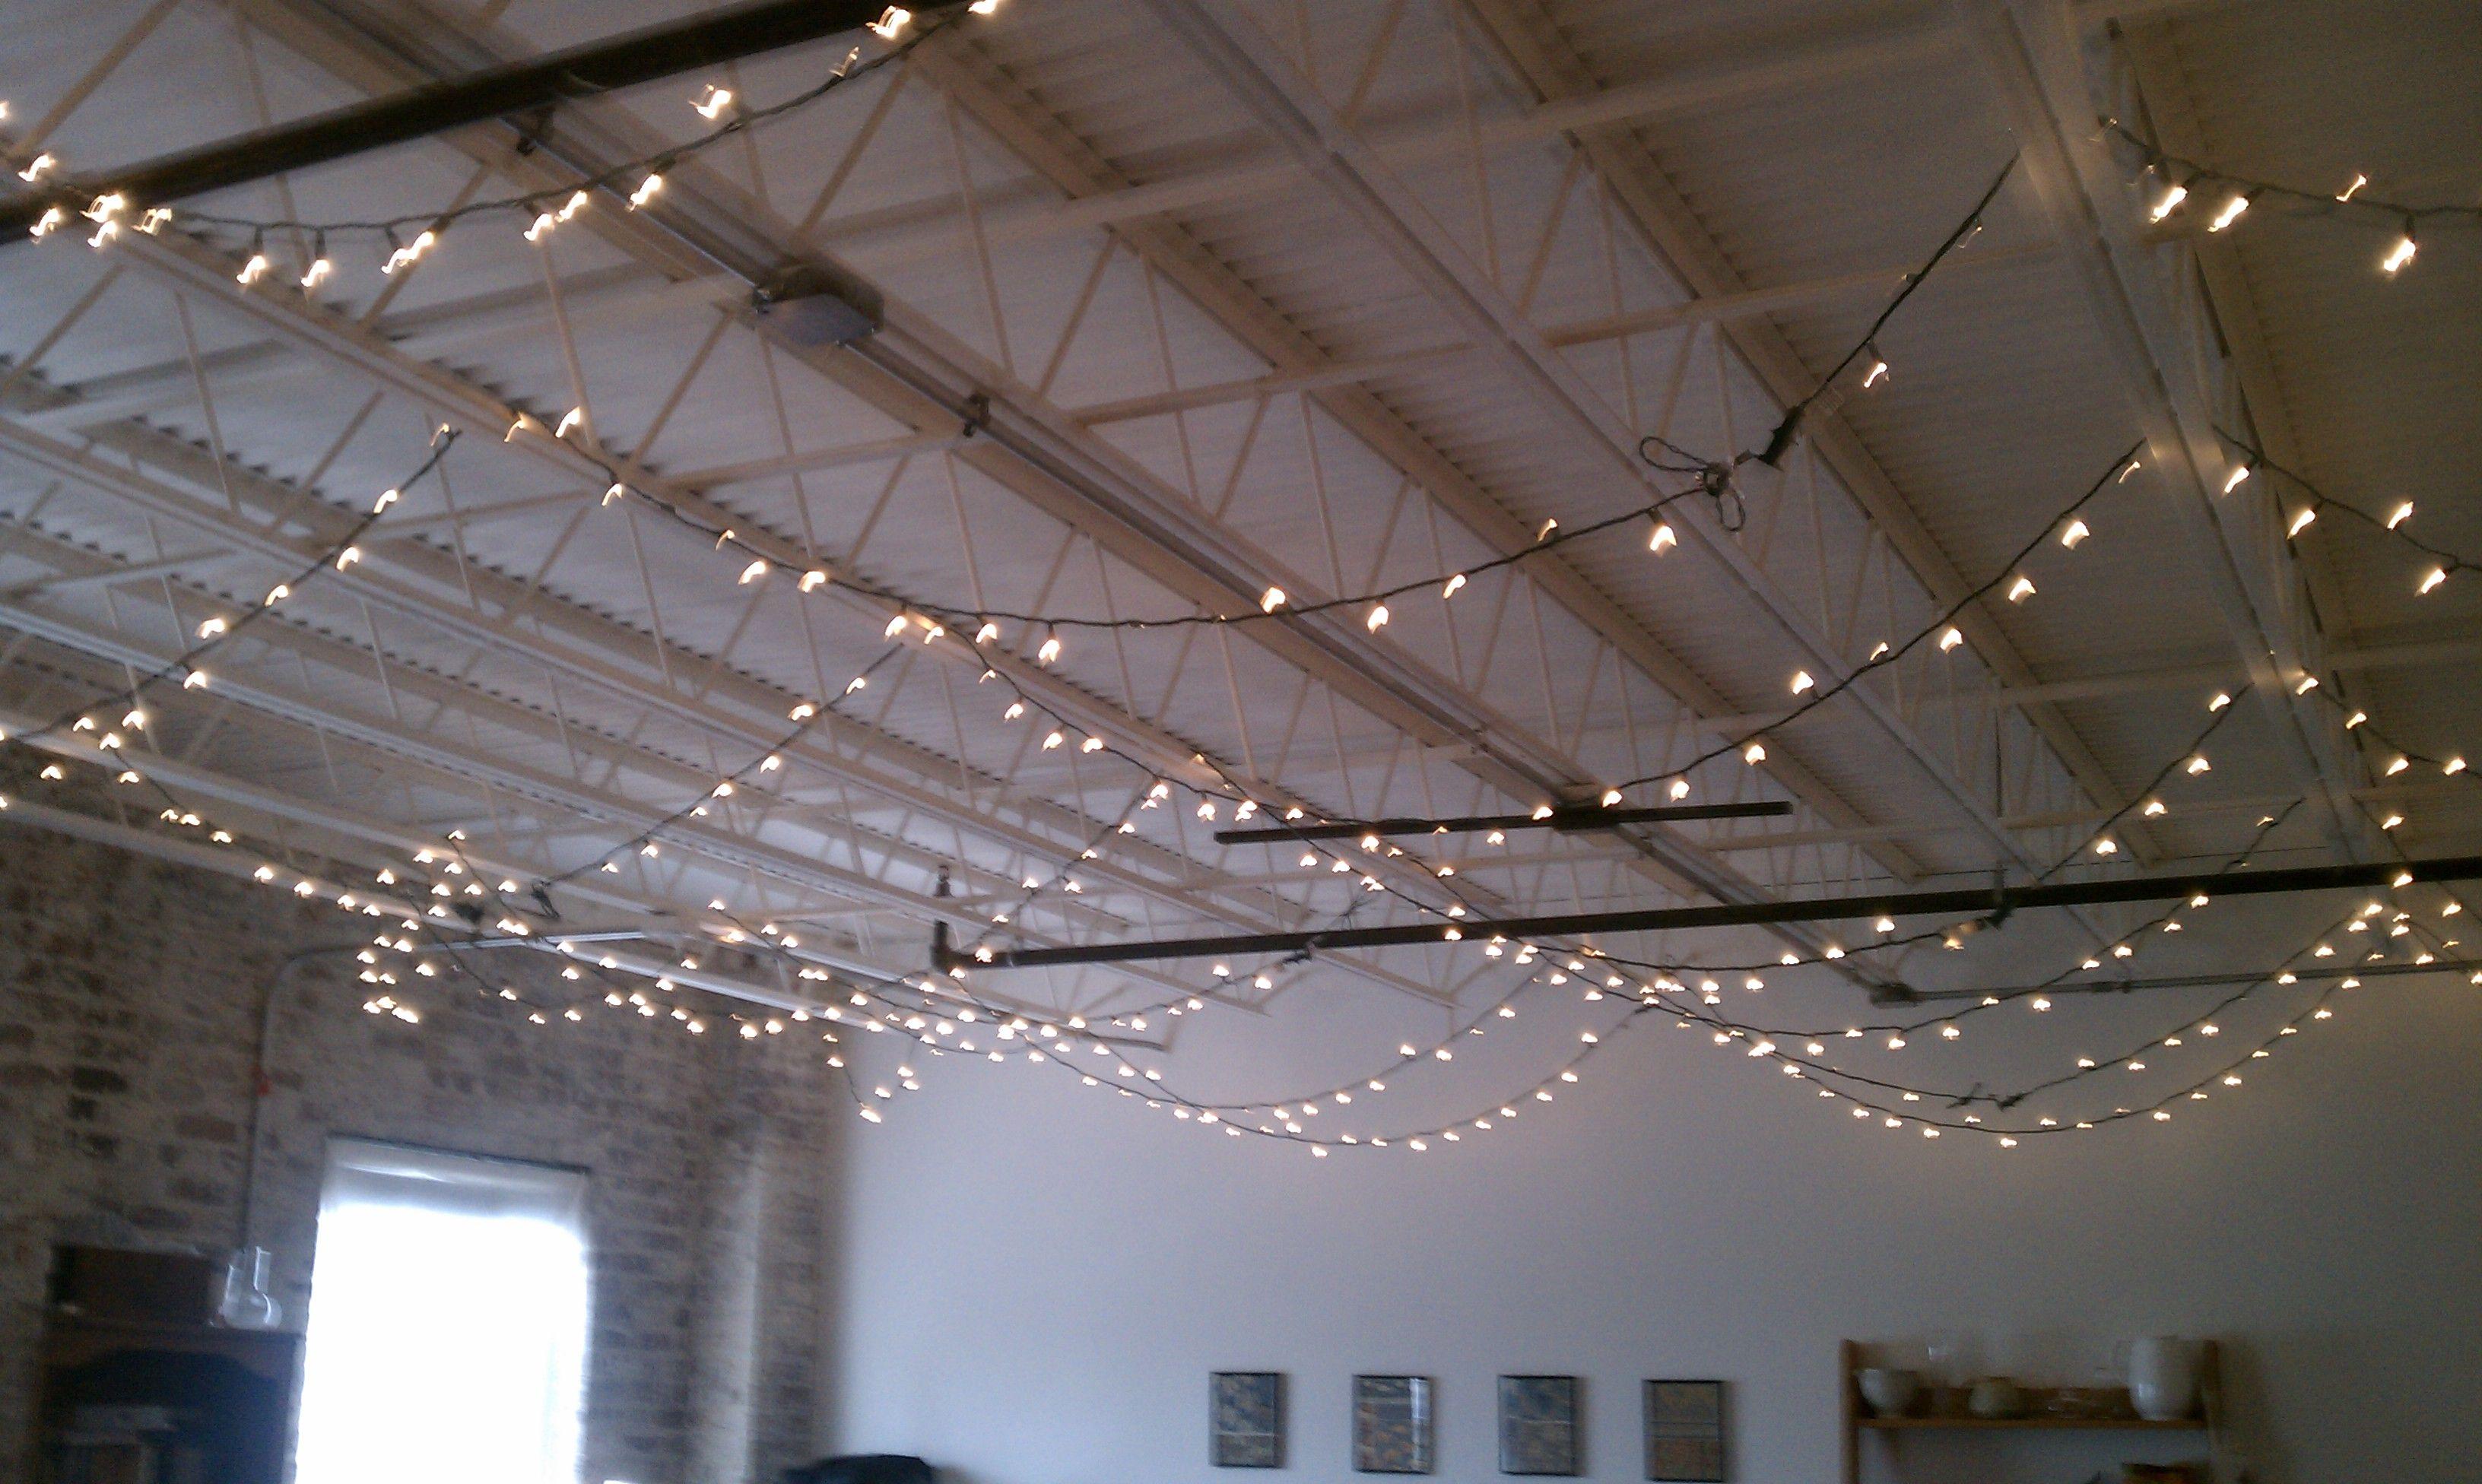 Using Christmas Lights Year Round Basement Much Better Than